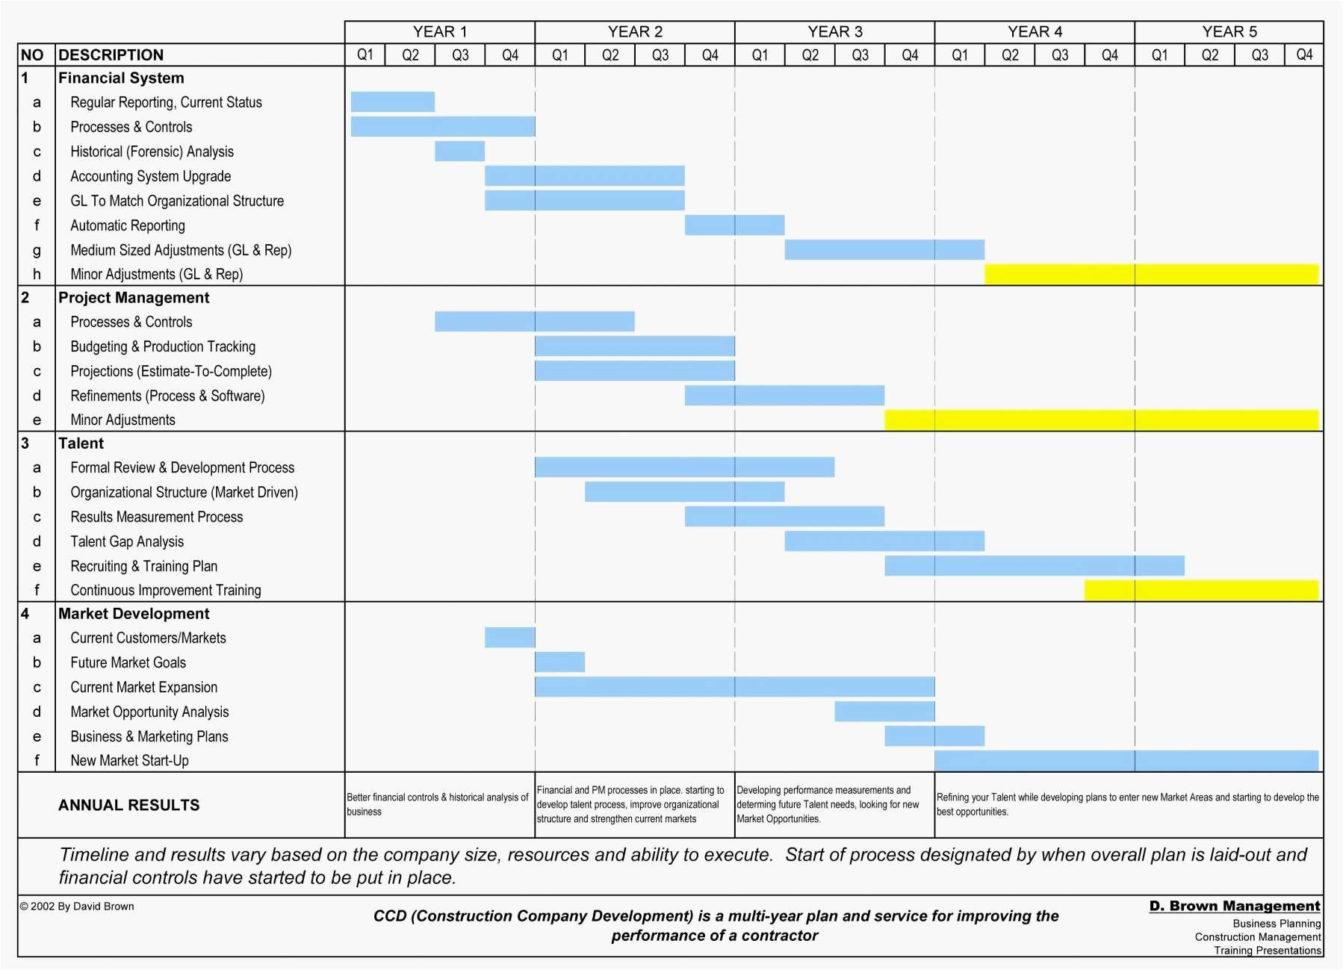 job management spreadsheet job management sheet management job market spreadsheet job sheet management software job sheet management system  Job Management Spreadsheet Throughout Job Tracking Spreadsheet – Spreadsheet Collections Job Management Spreadsheet Google Spreadshee